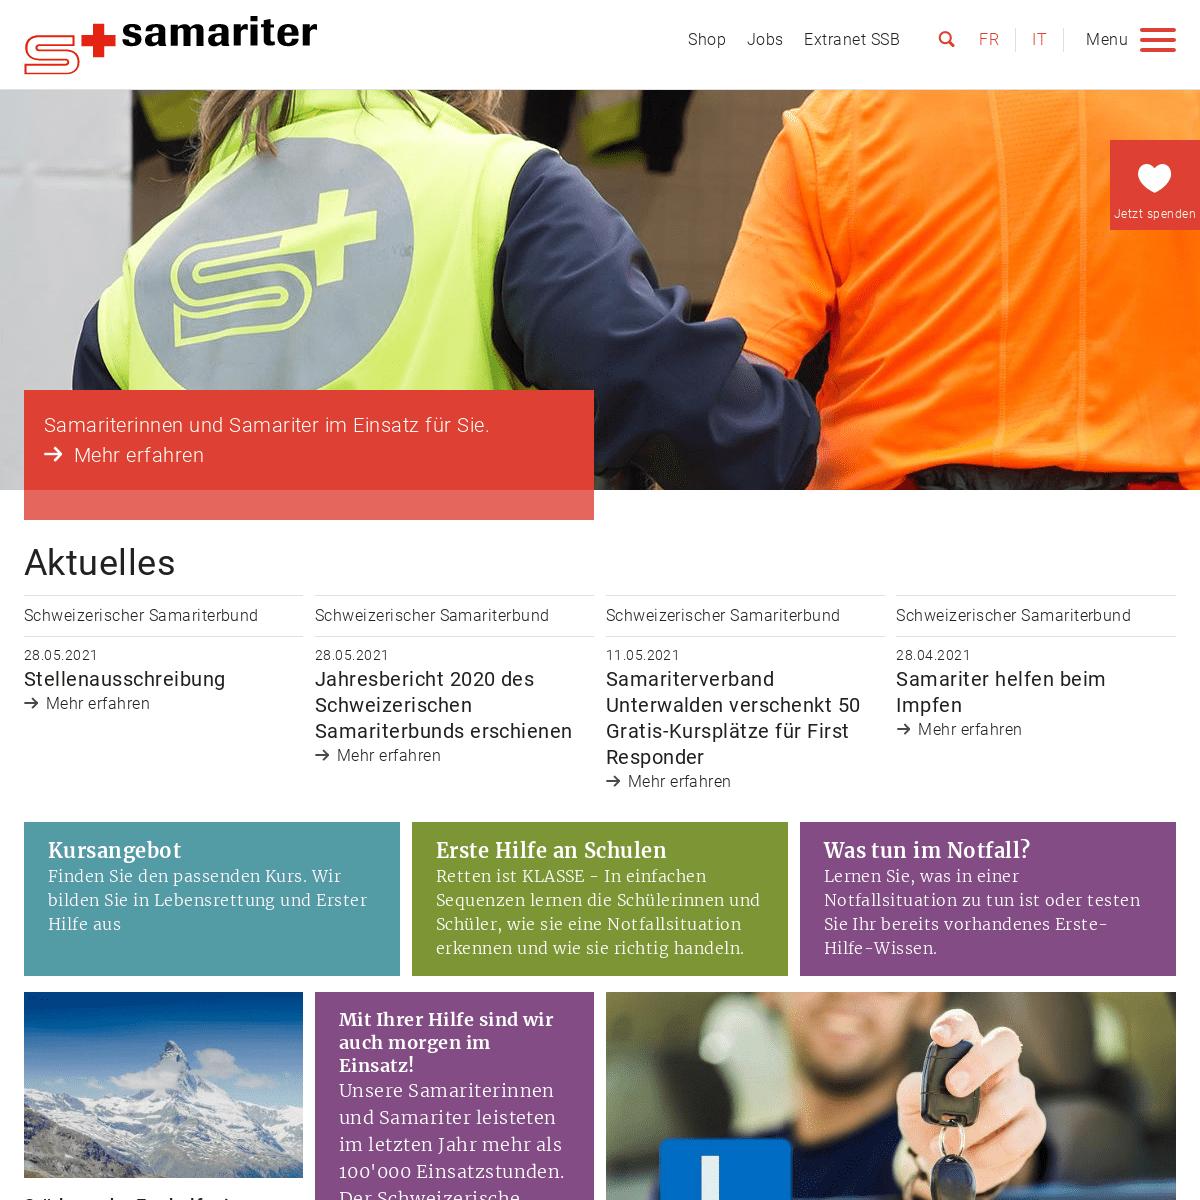 A complete backup of https://samariter.ch